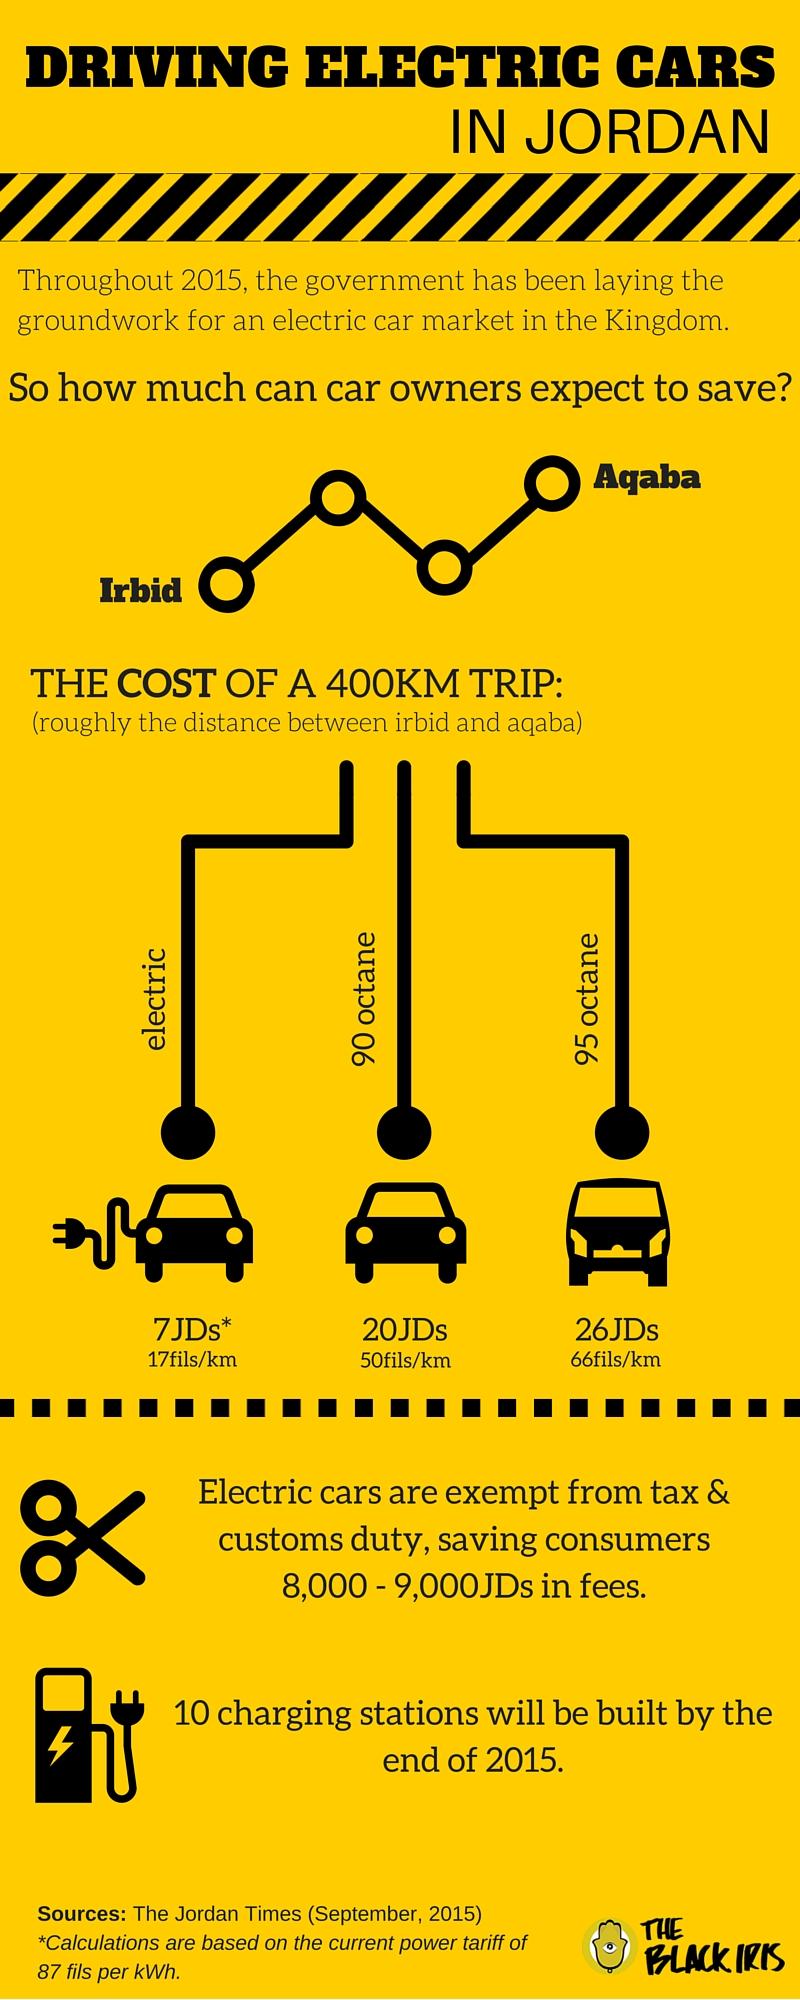 Driving An Electric Car In Jordan The Black Iris Charger Diagram Enlarge